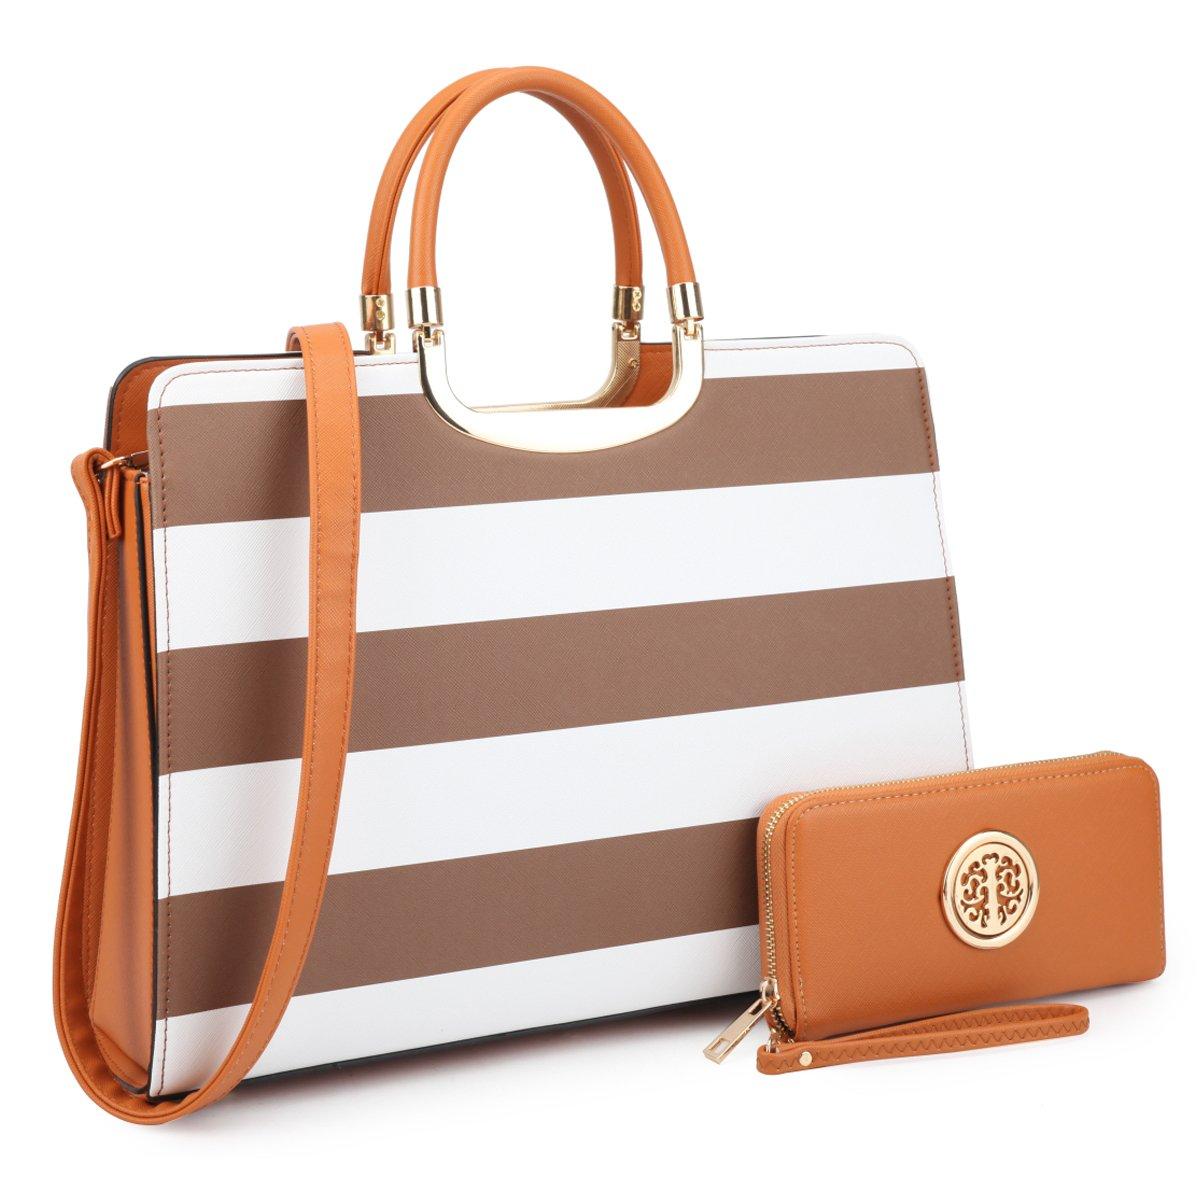 Designer Women Laptop Briefcase, Large Handbag for Lady PU Leather Satchel Lightweight Tote Summer Cross-Body Purse 02-2828 CF/WT